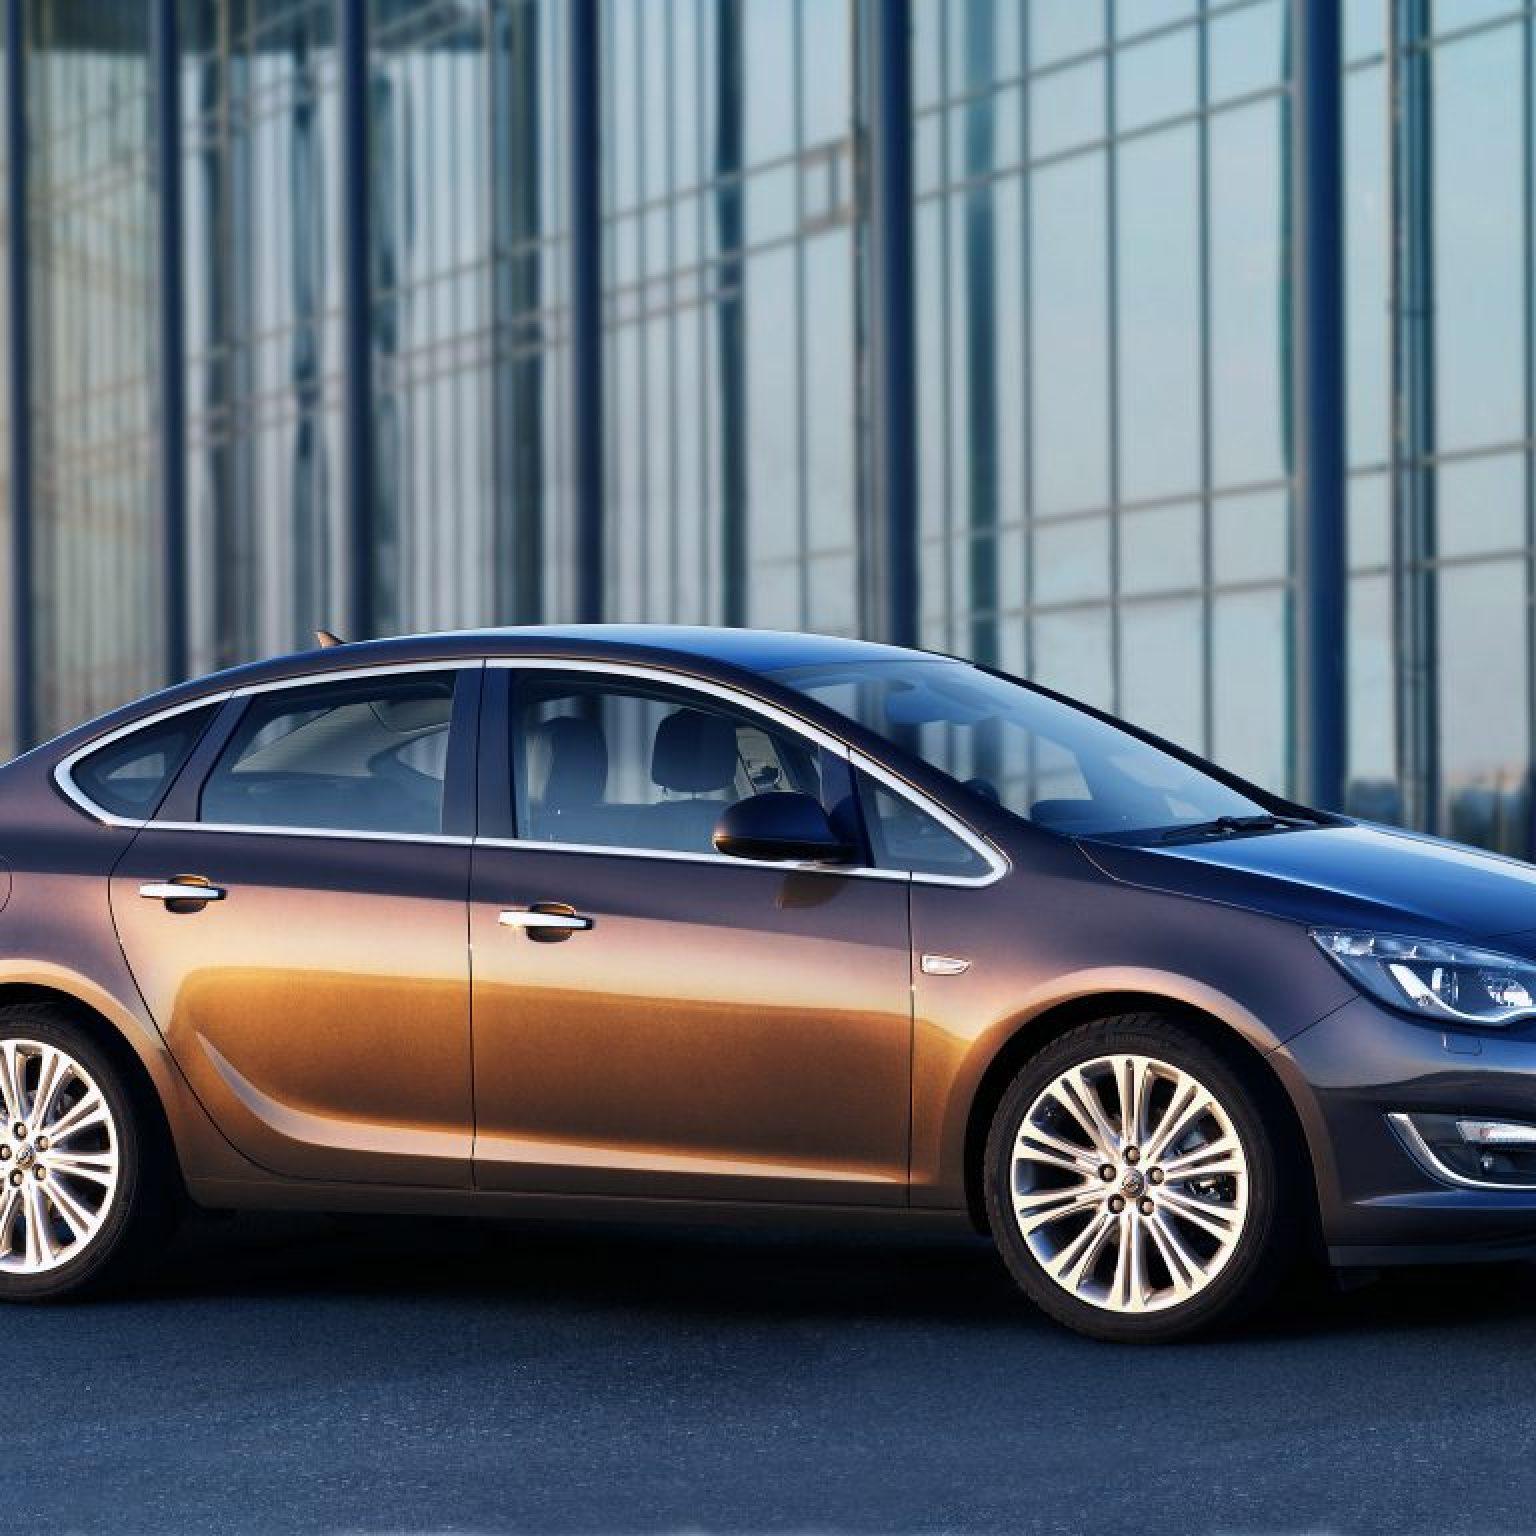 2012 Opel Astra Sedan J